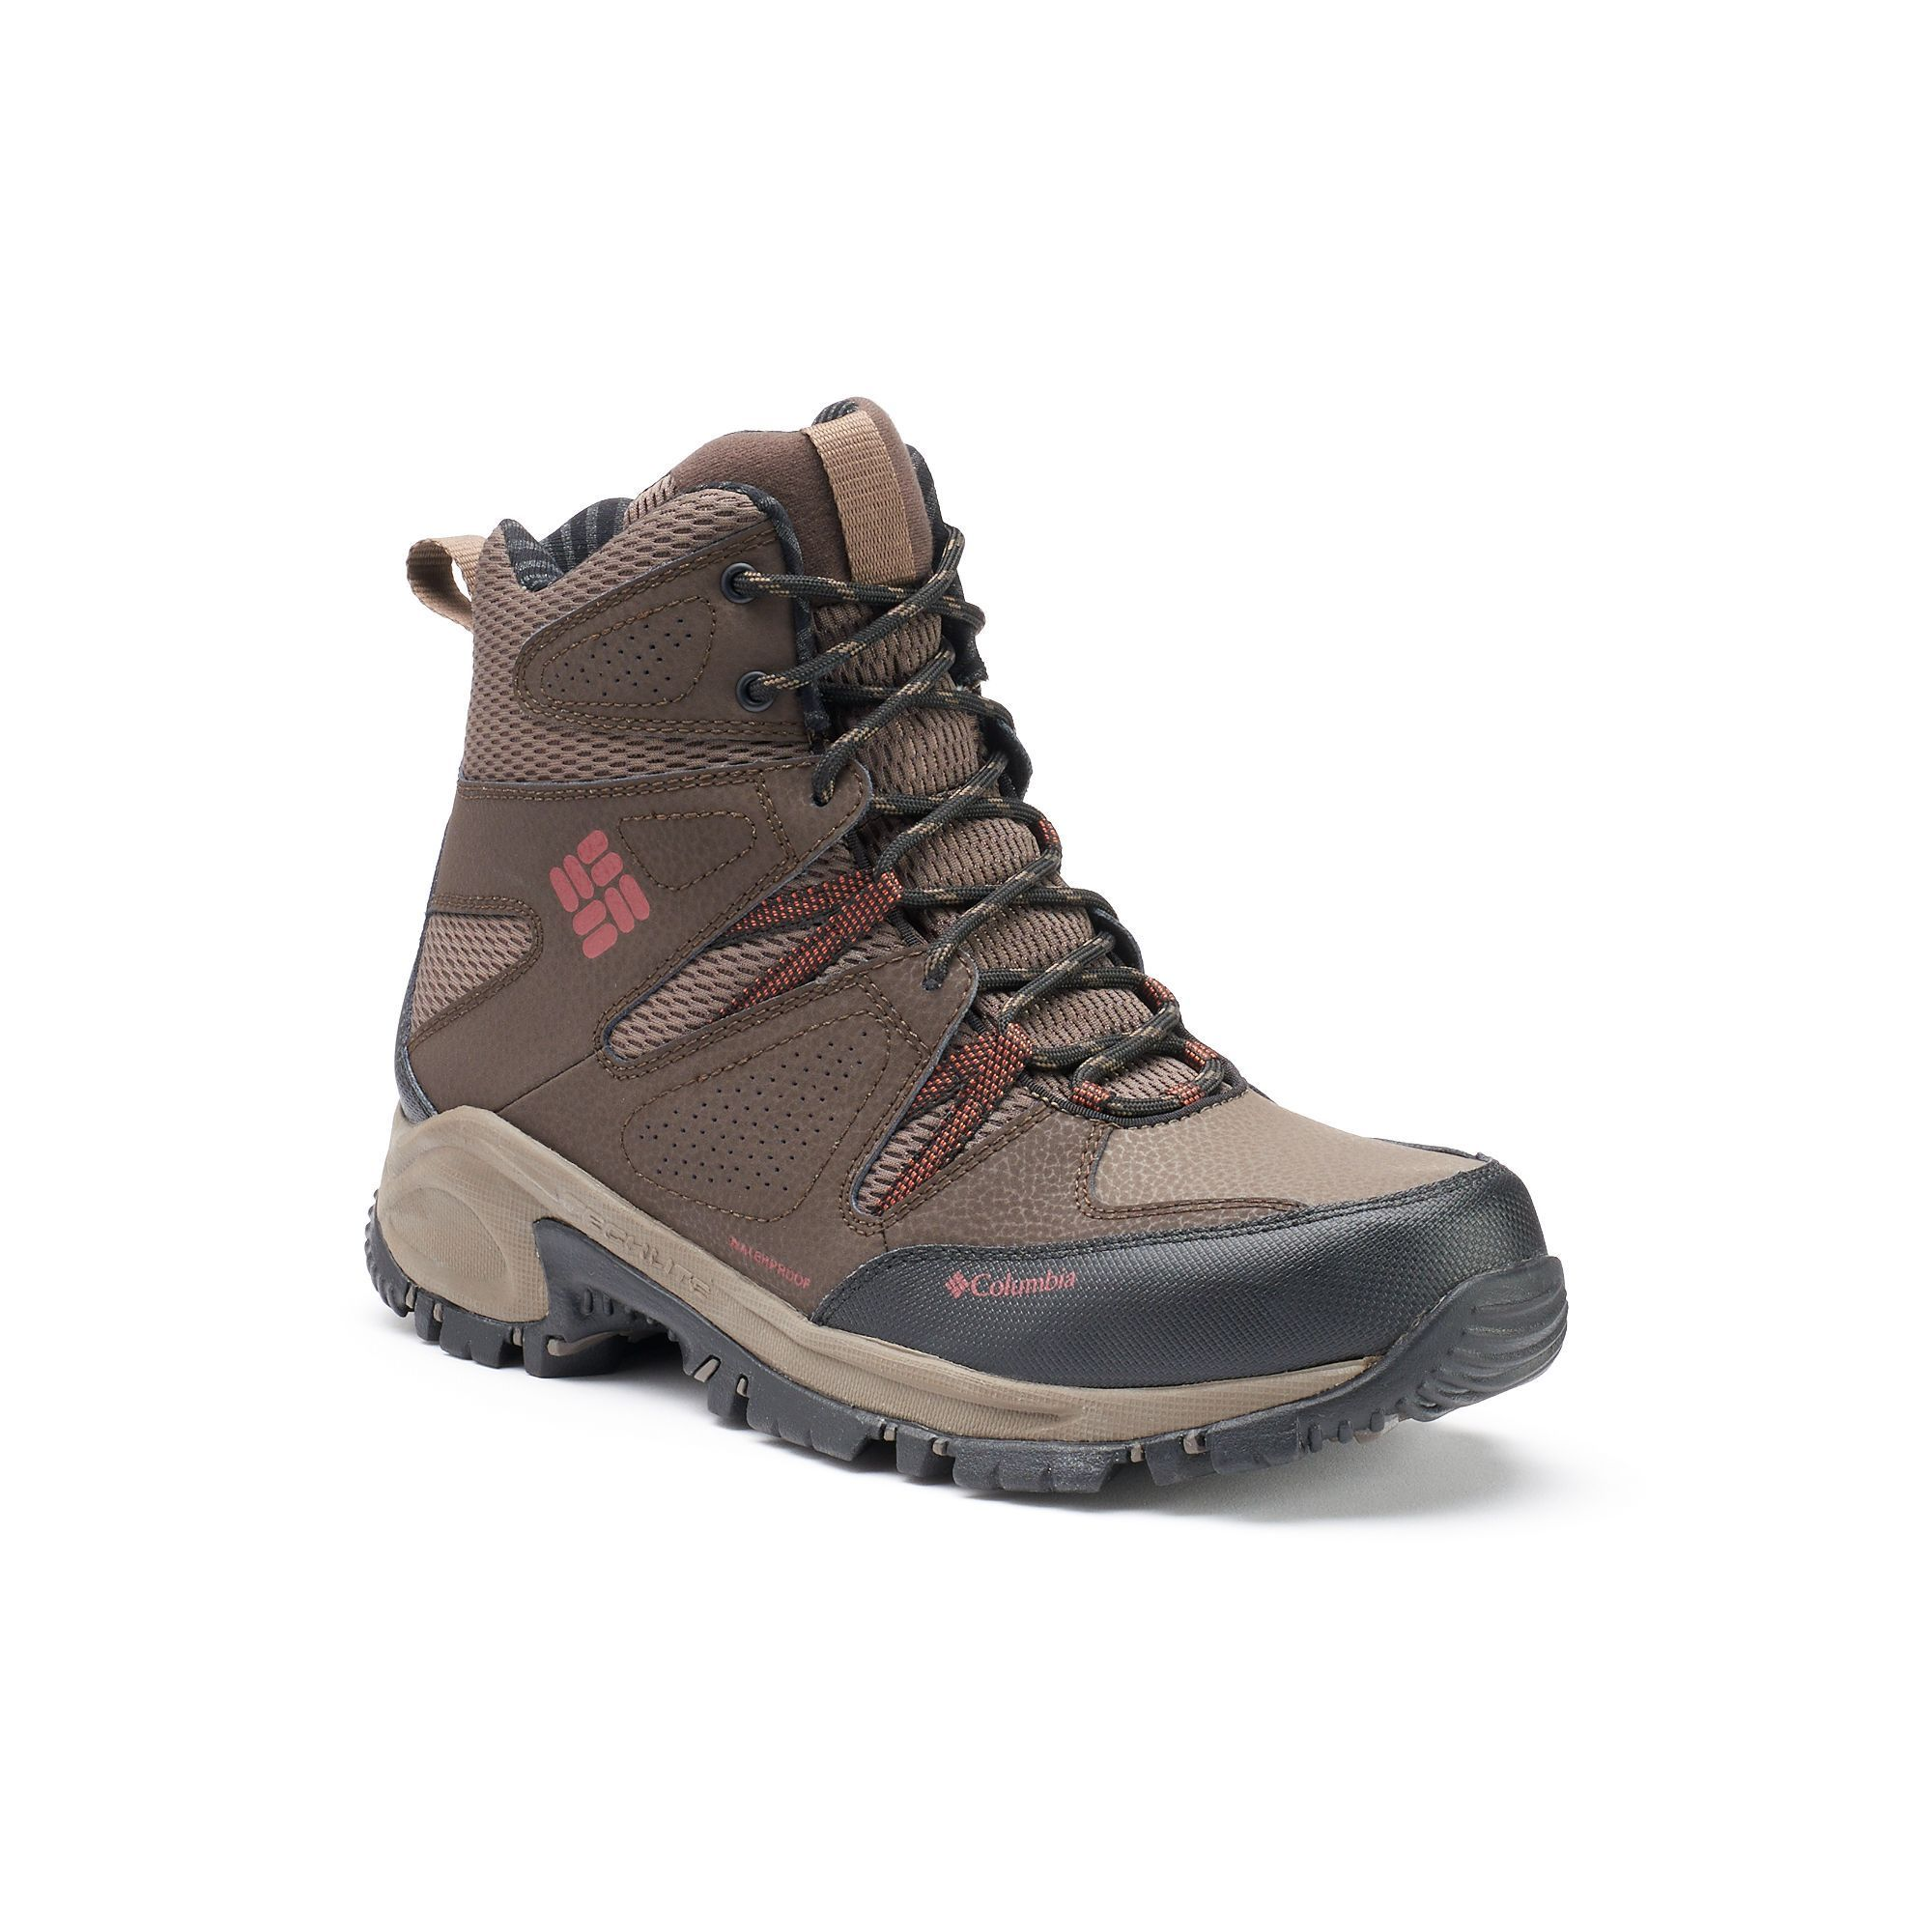 15c5429ec80 Columbia Liftop II Thermal Coil Men's Waterproof Hiking Boots, Size ...